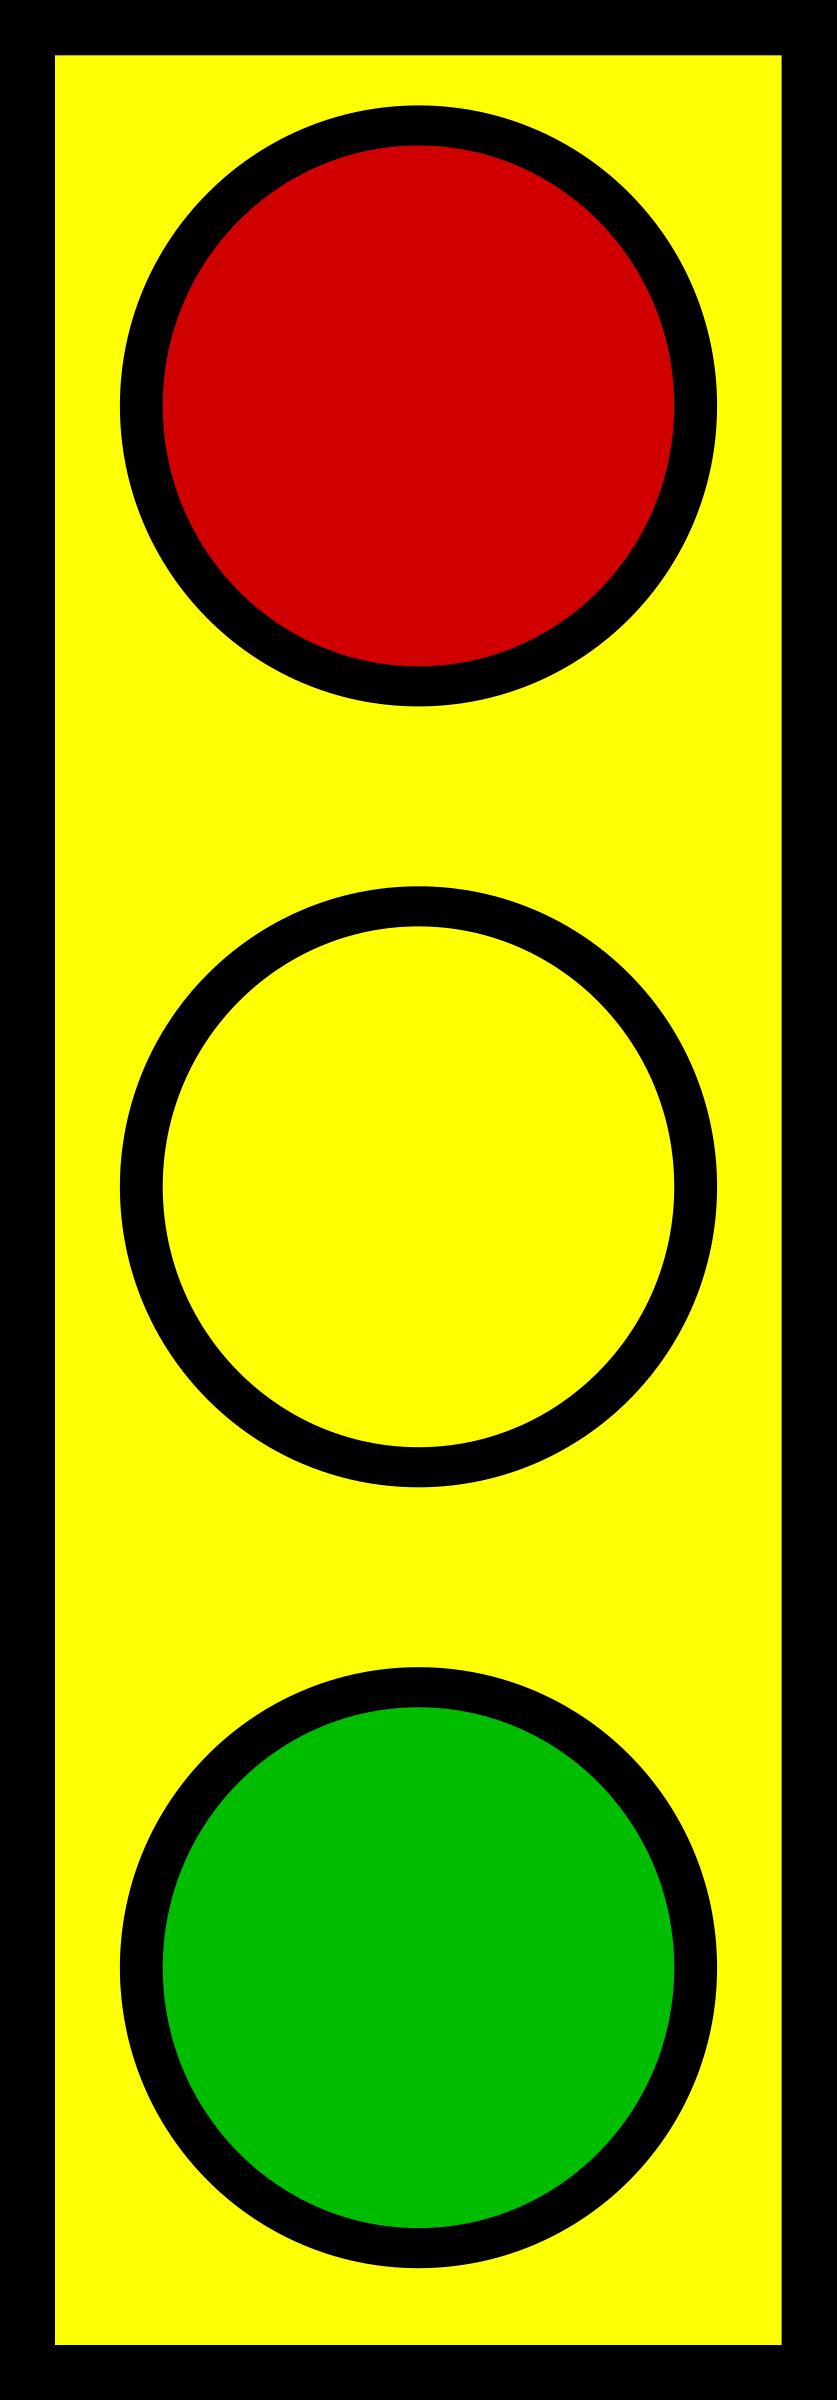 Stoplight Clipart Clipart - stoplight